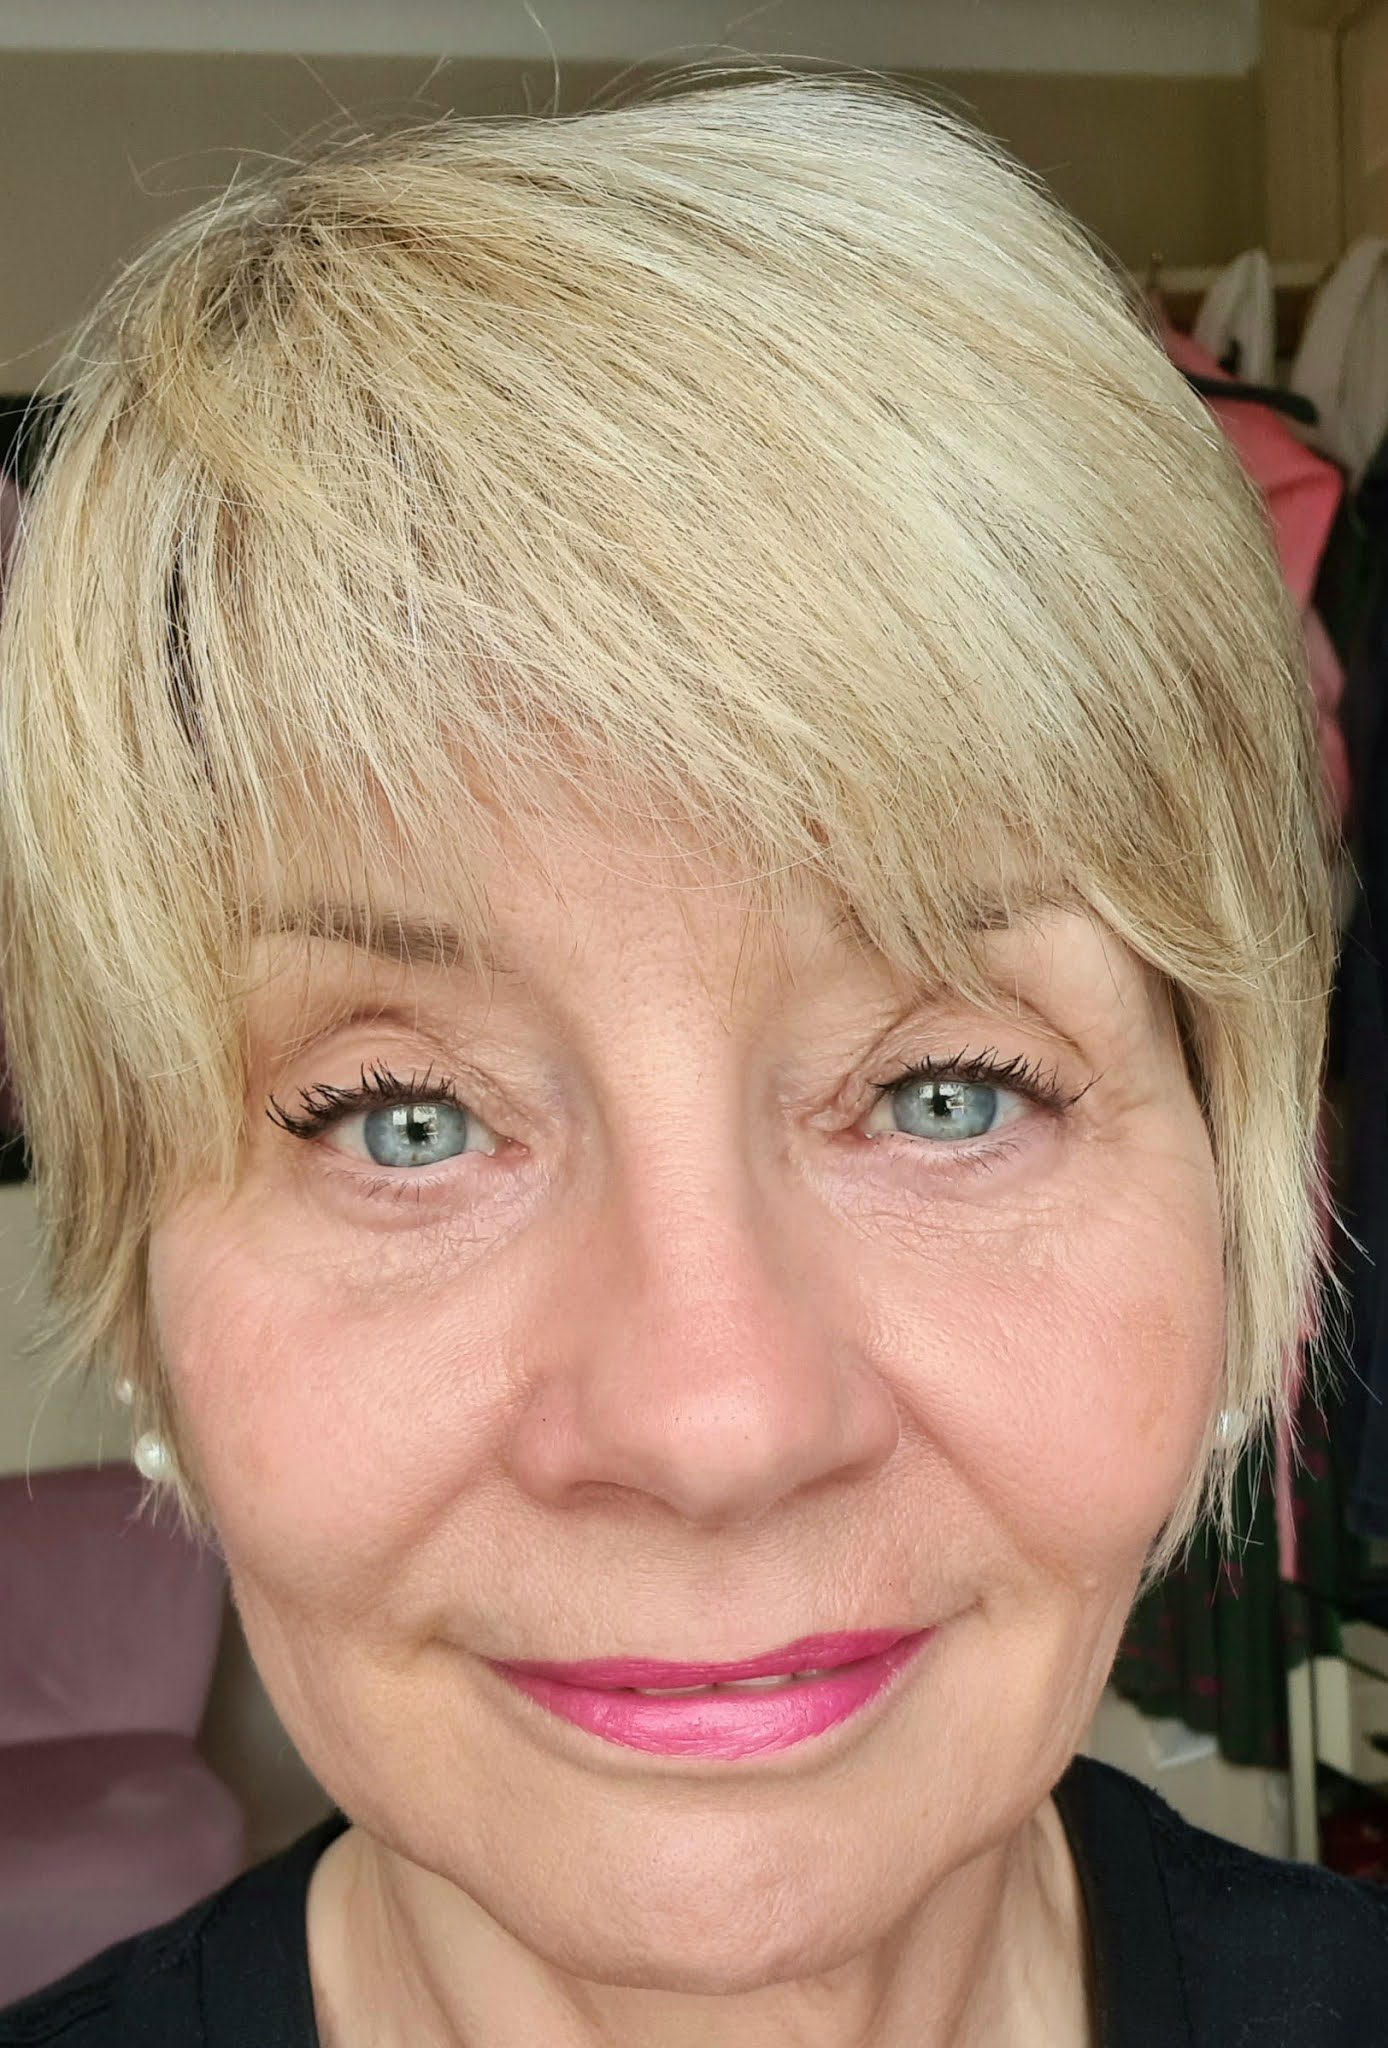 After using Guerlain Terracotta Nude powder: Is This Mutton blogger Gail Hanlon